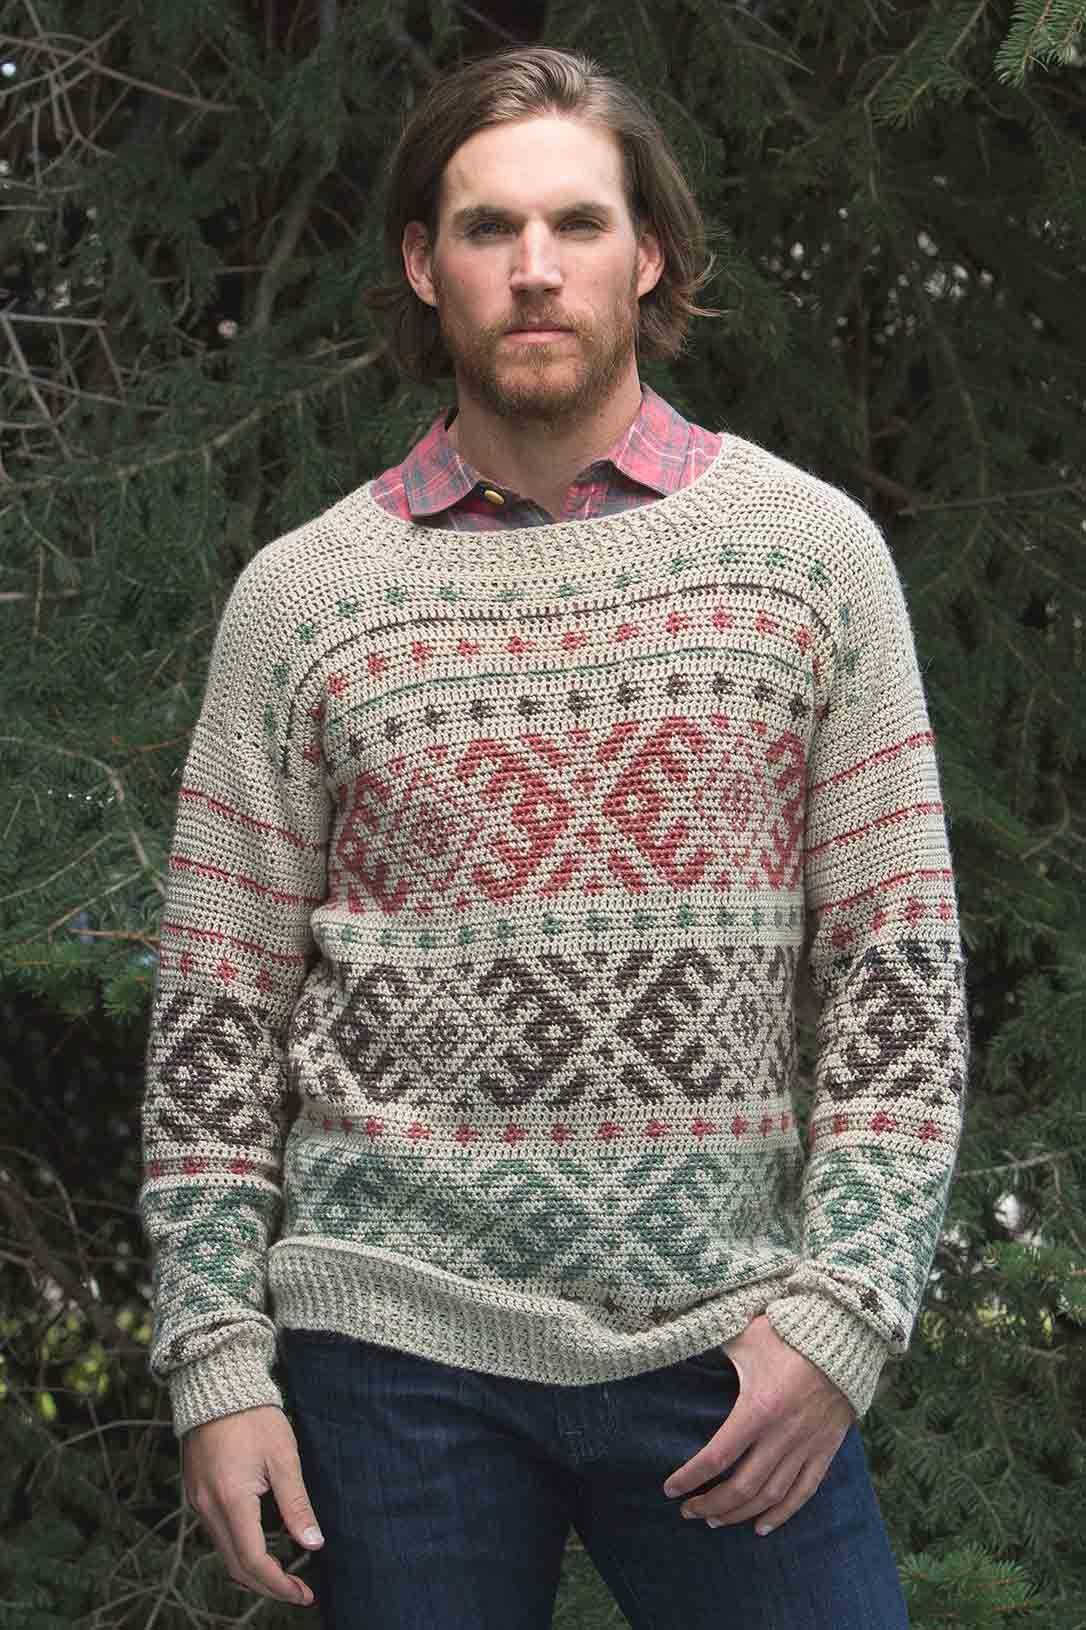 Crochet Winter 2018 Digital Edition | Interweave crochet, Tapestry ...